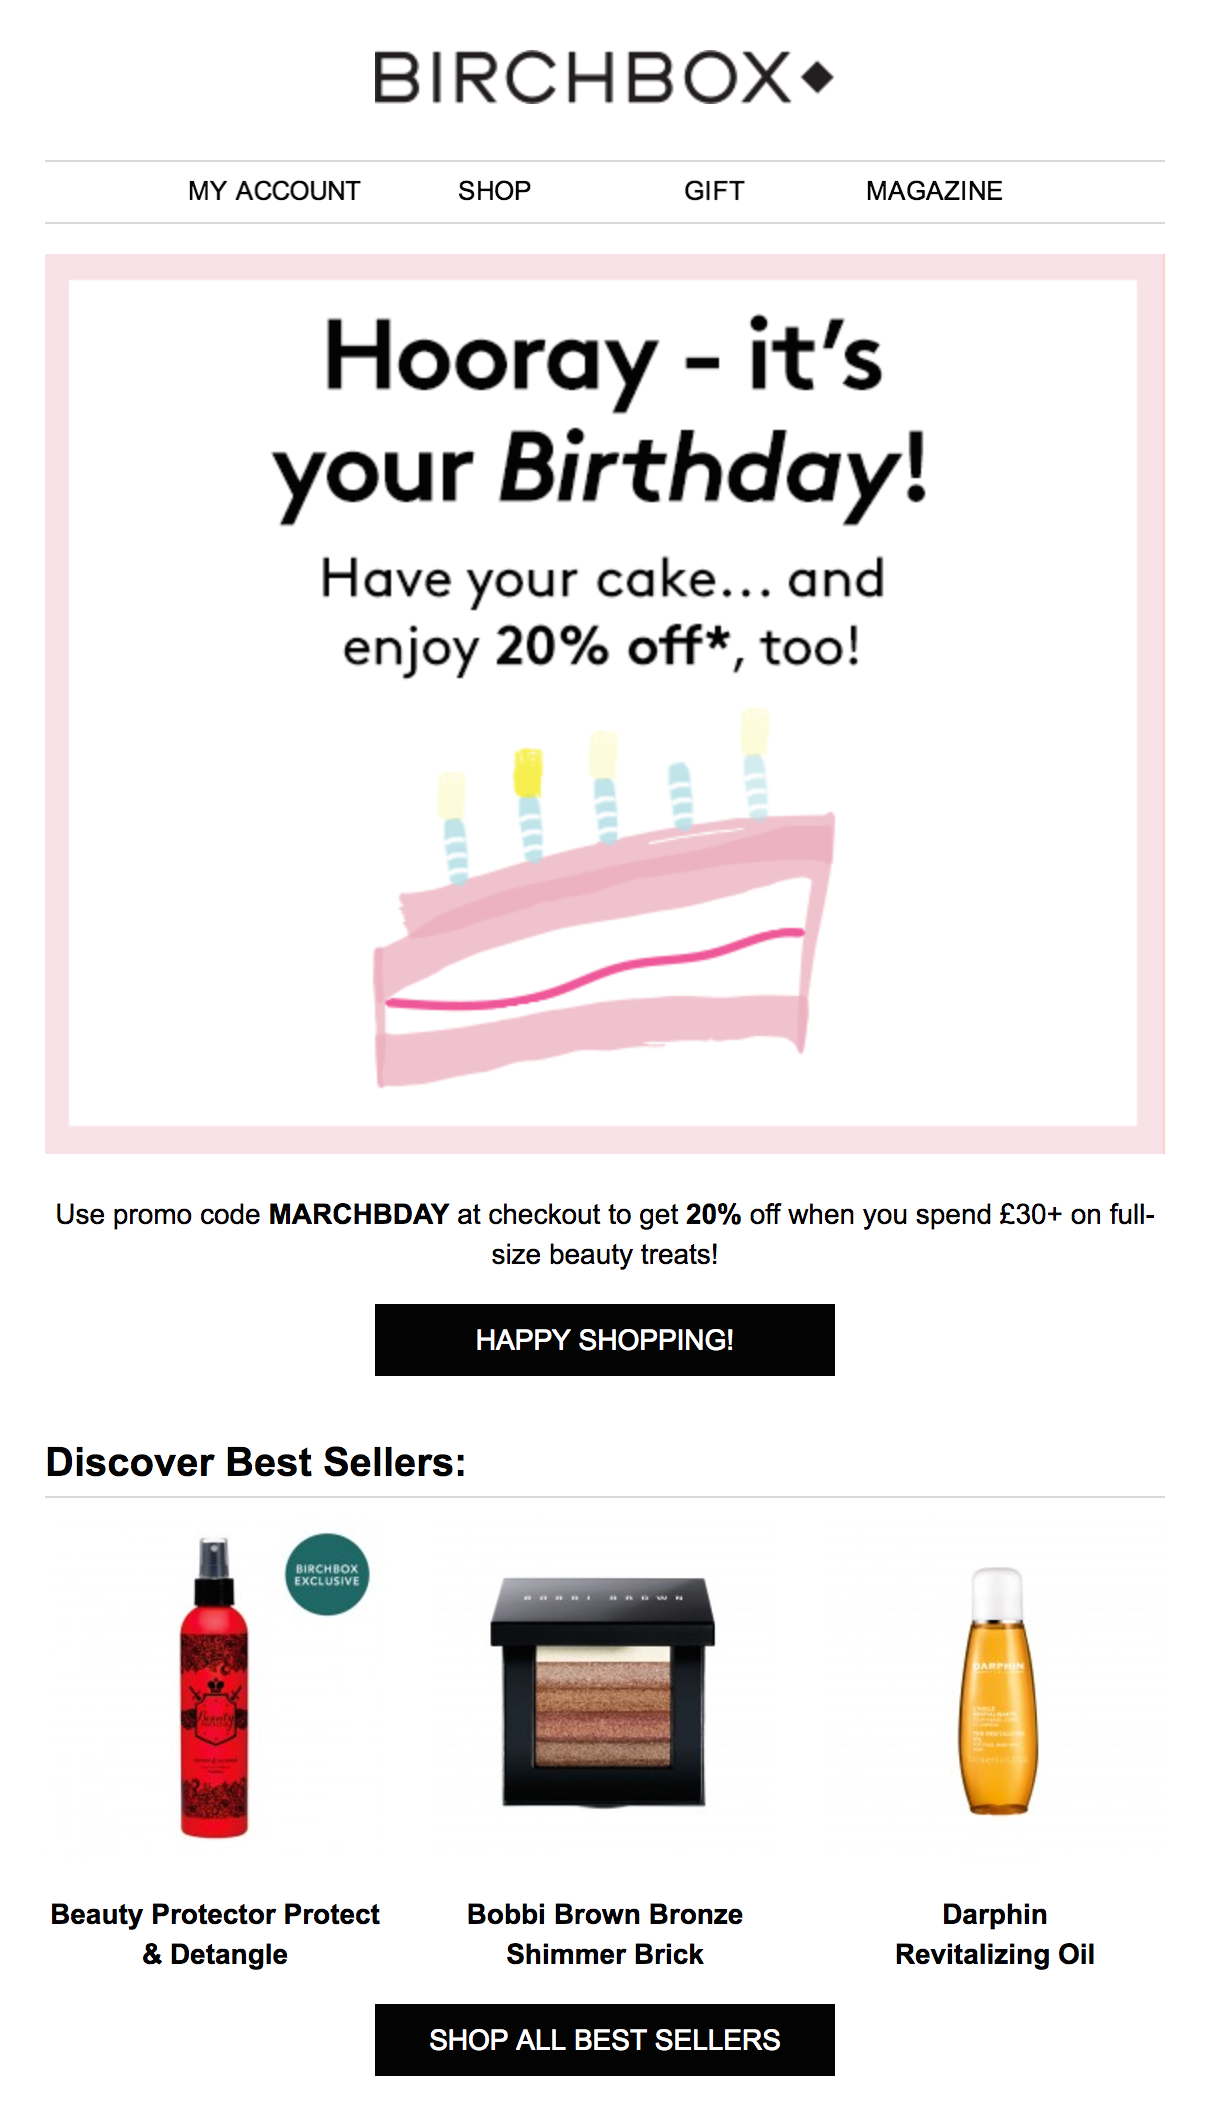 Birthday-email-Birchbox.png